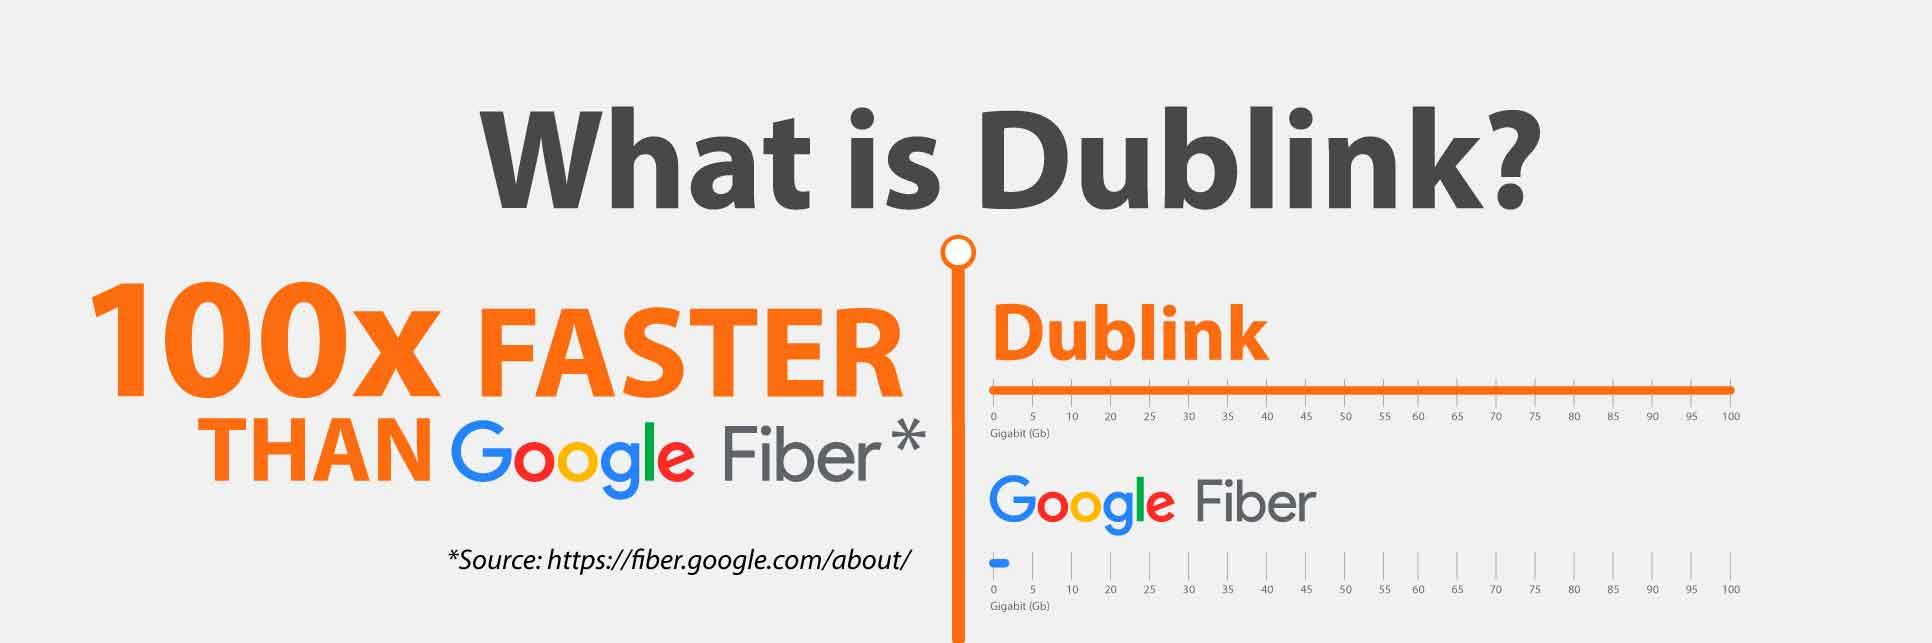 Dublink Broadband   Thrive in Dublin, Ohio, USA